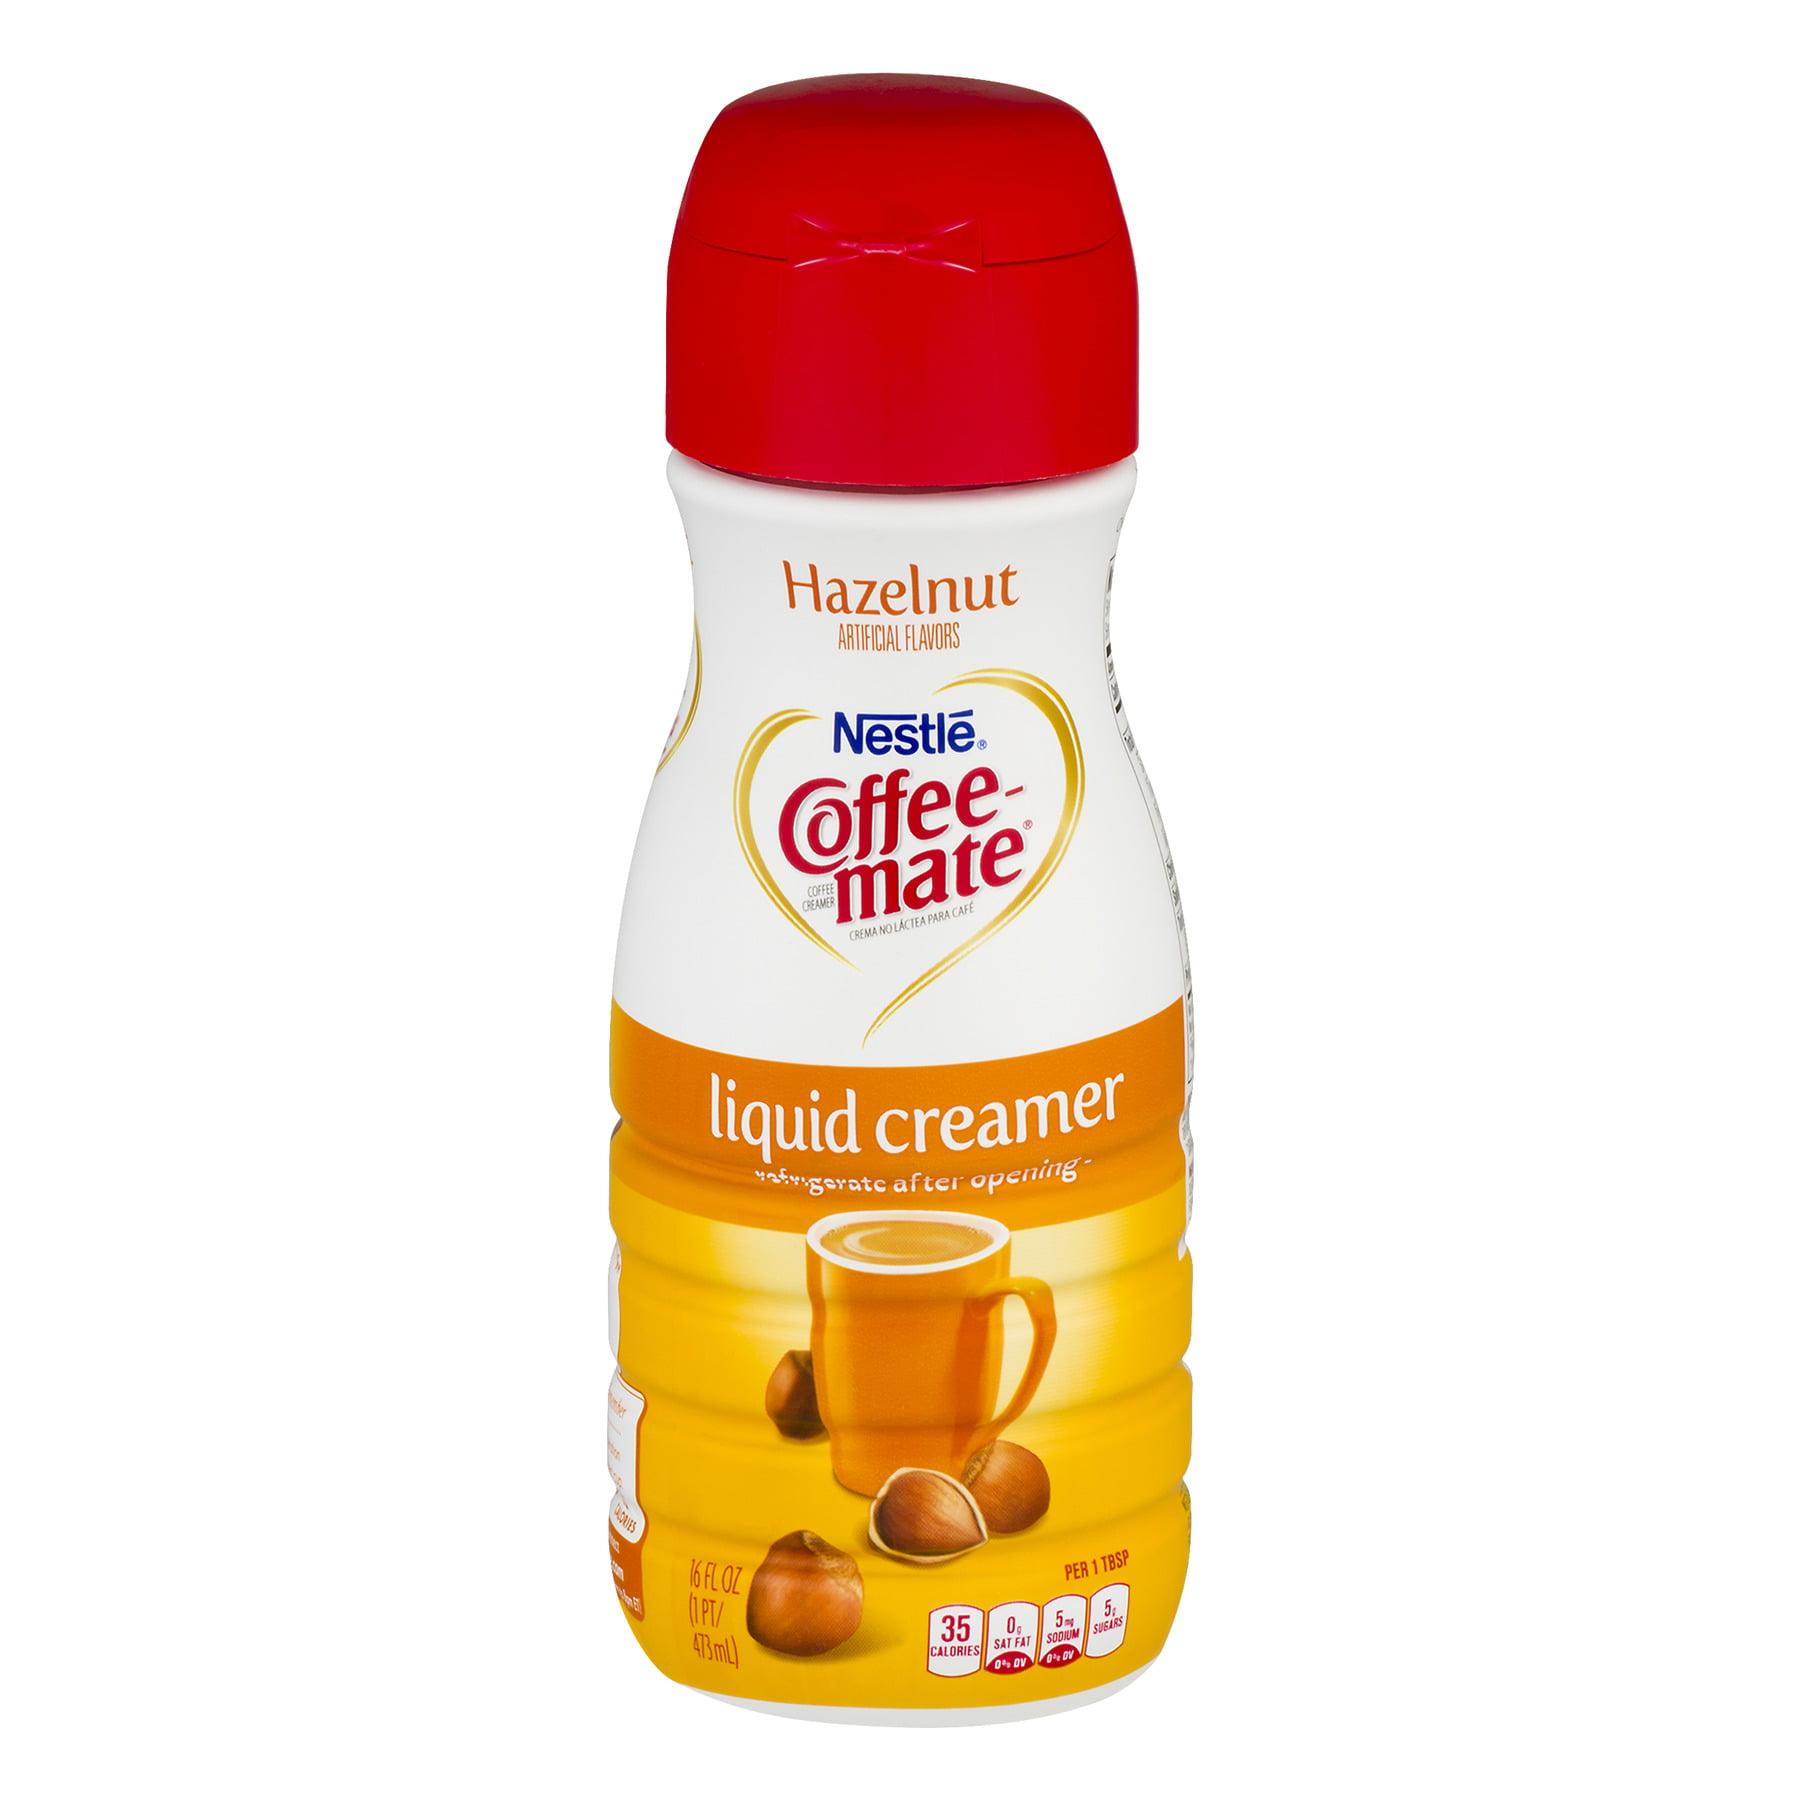 COFFEE MATE Hazelnut Liquid Coffee Creamer 16 fl. oz. Bottle (3 Pack)